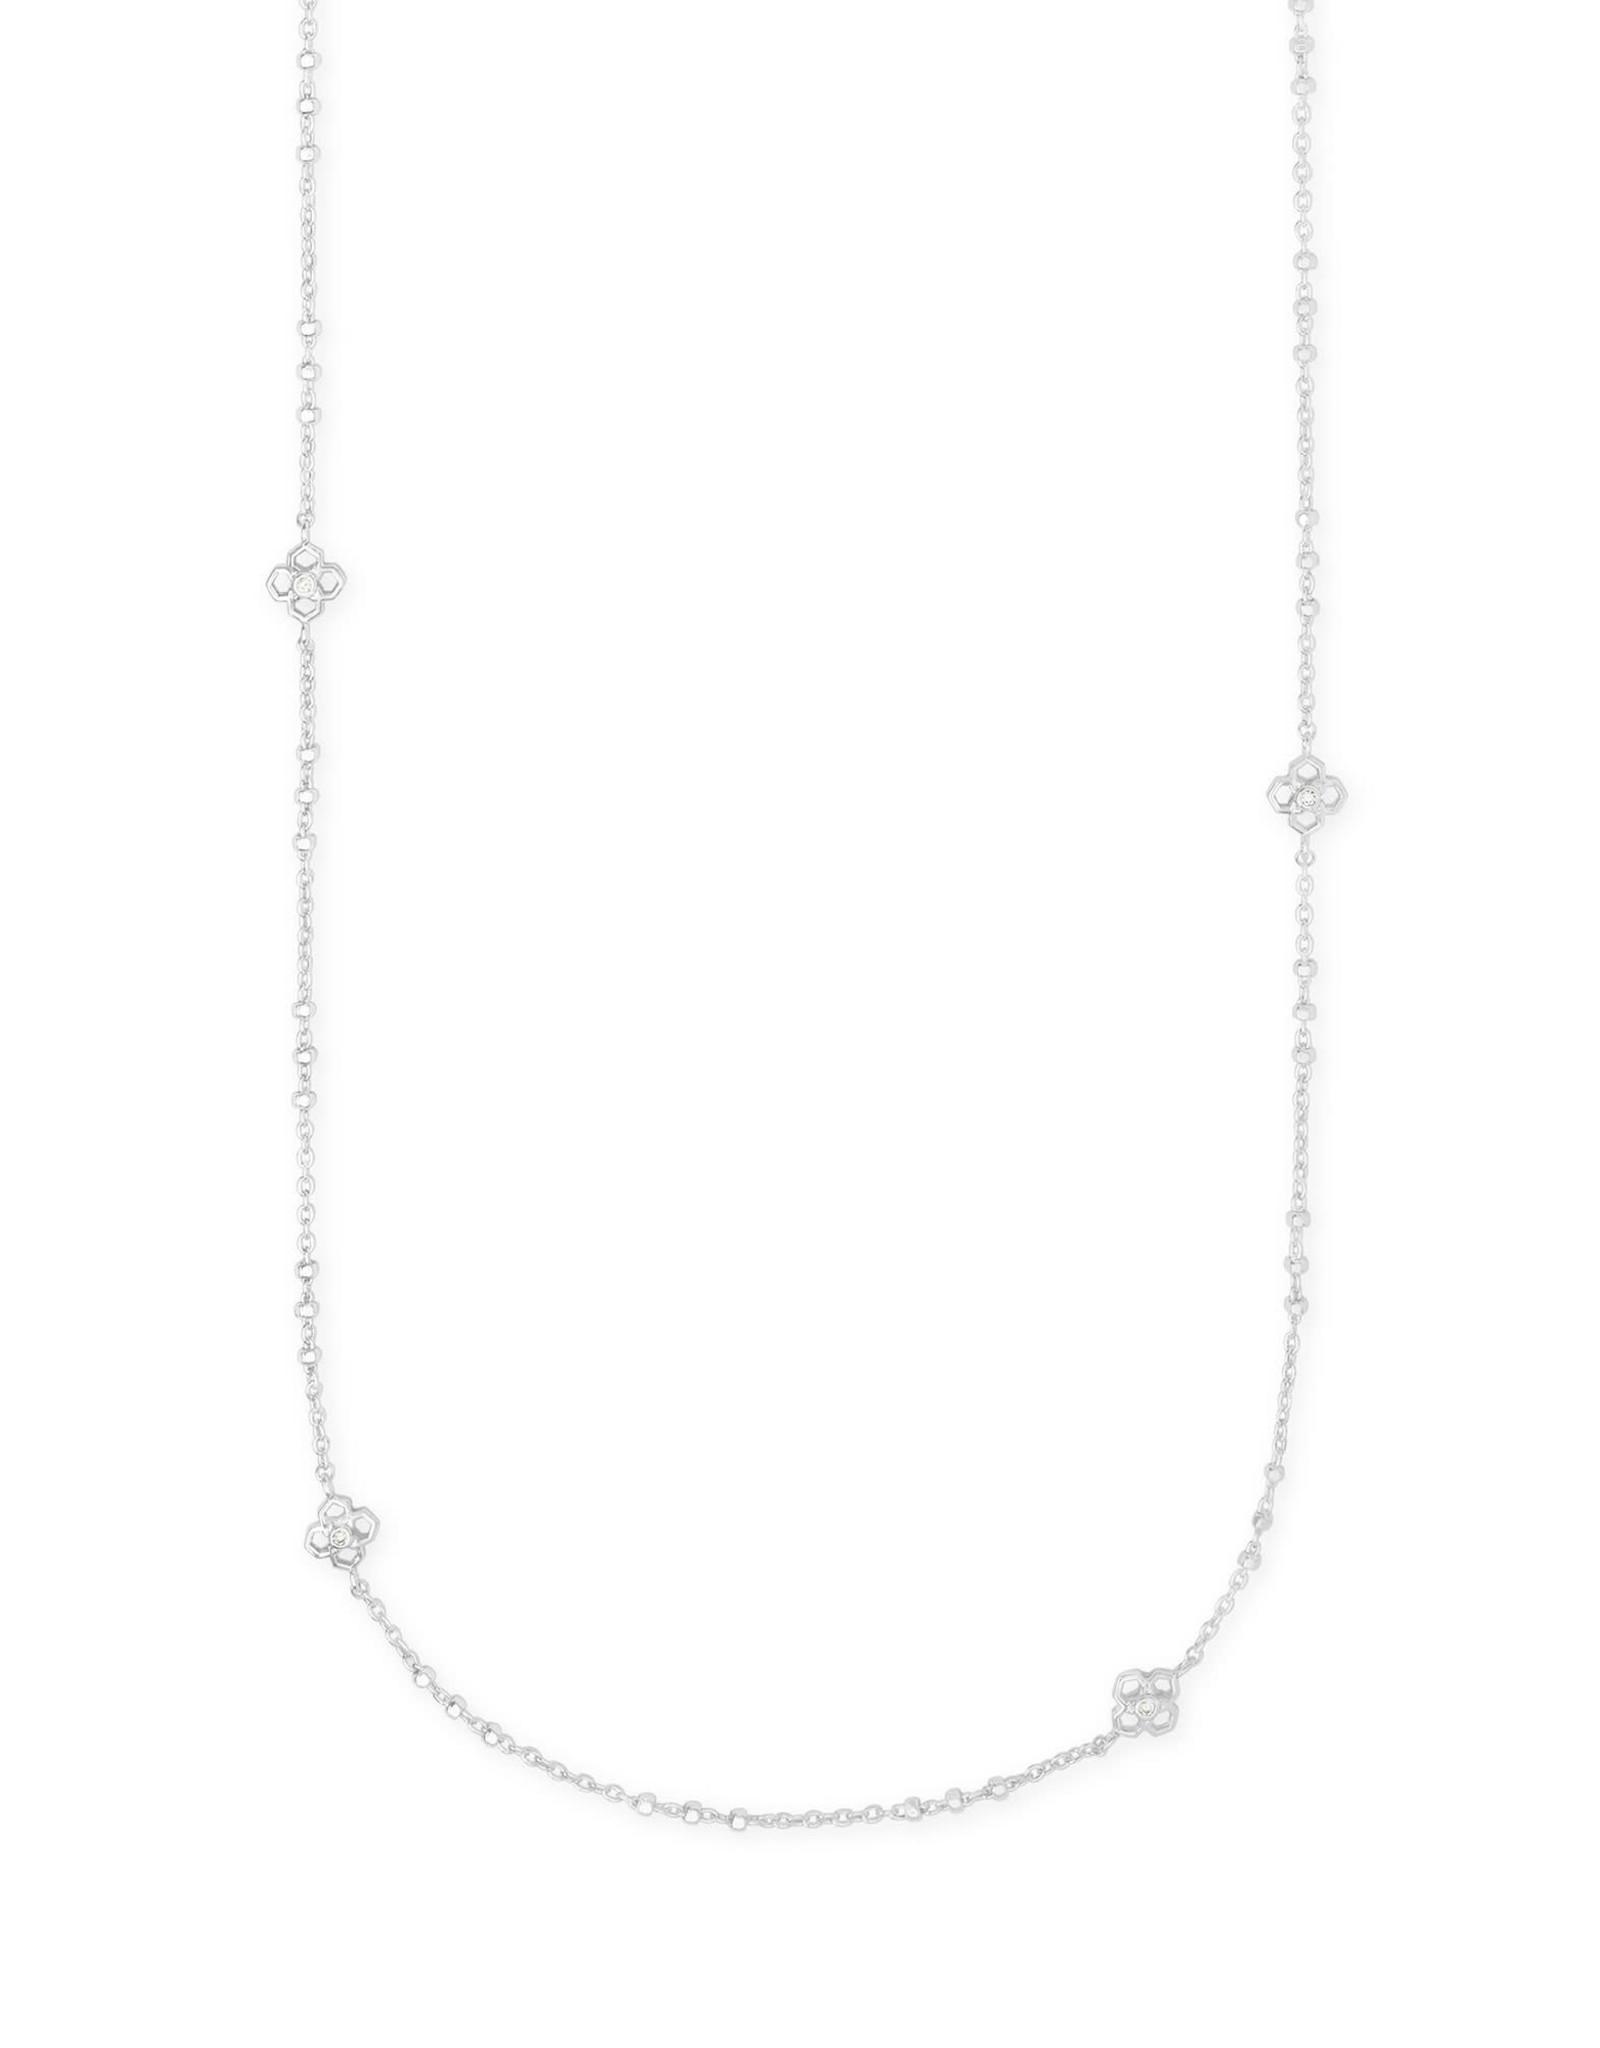 Kendra Scott Rue Long Strand Necklace - Rhodium Metal